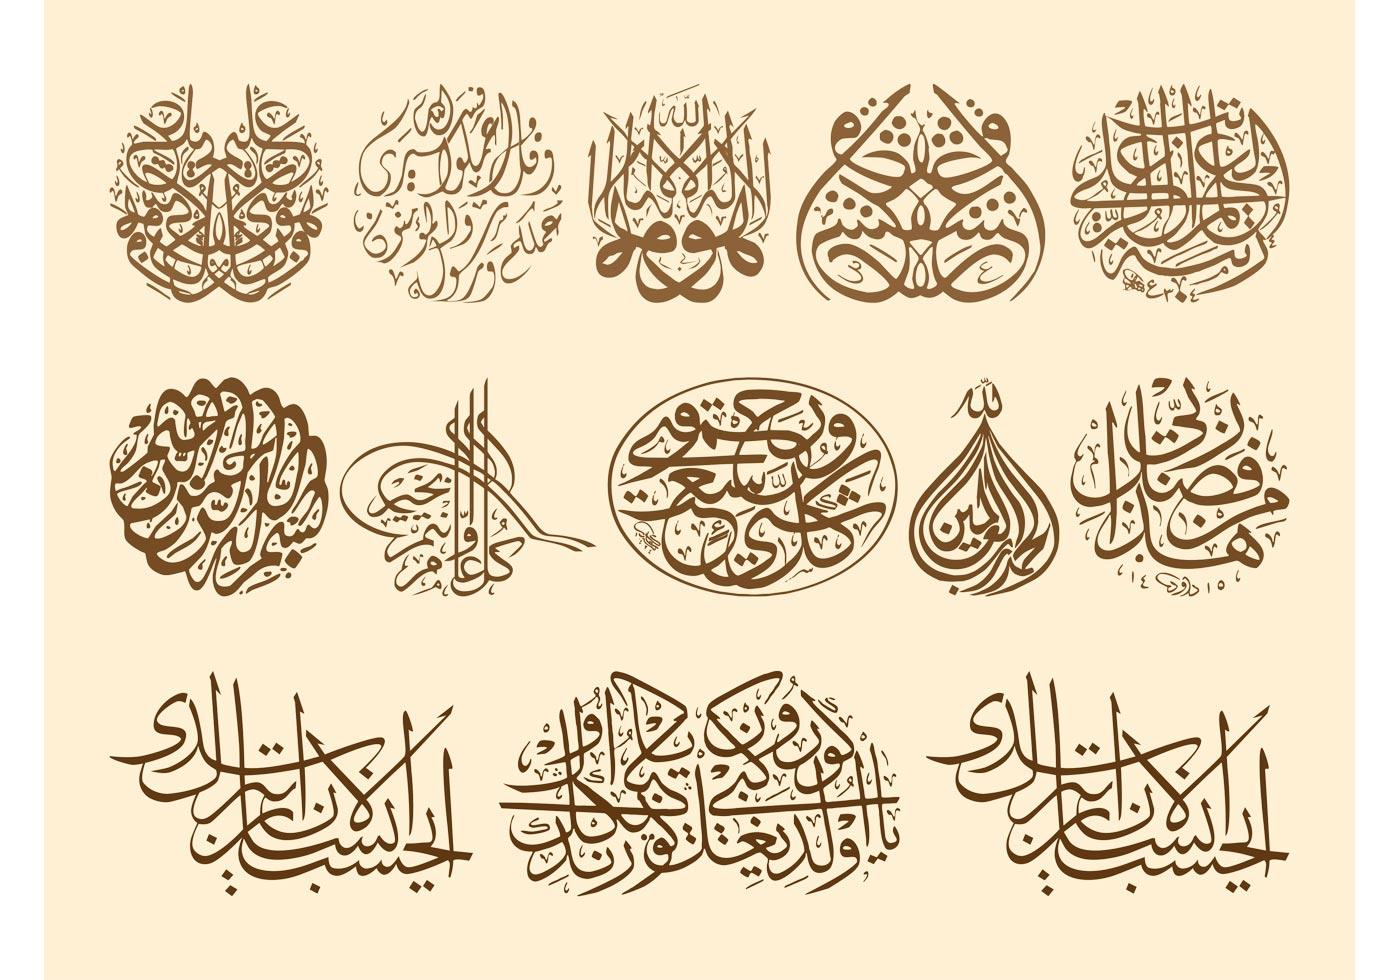 Masha Allah Hd Wallpaper Islamic Calligraphy Footage Download Free Vector Art